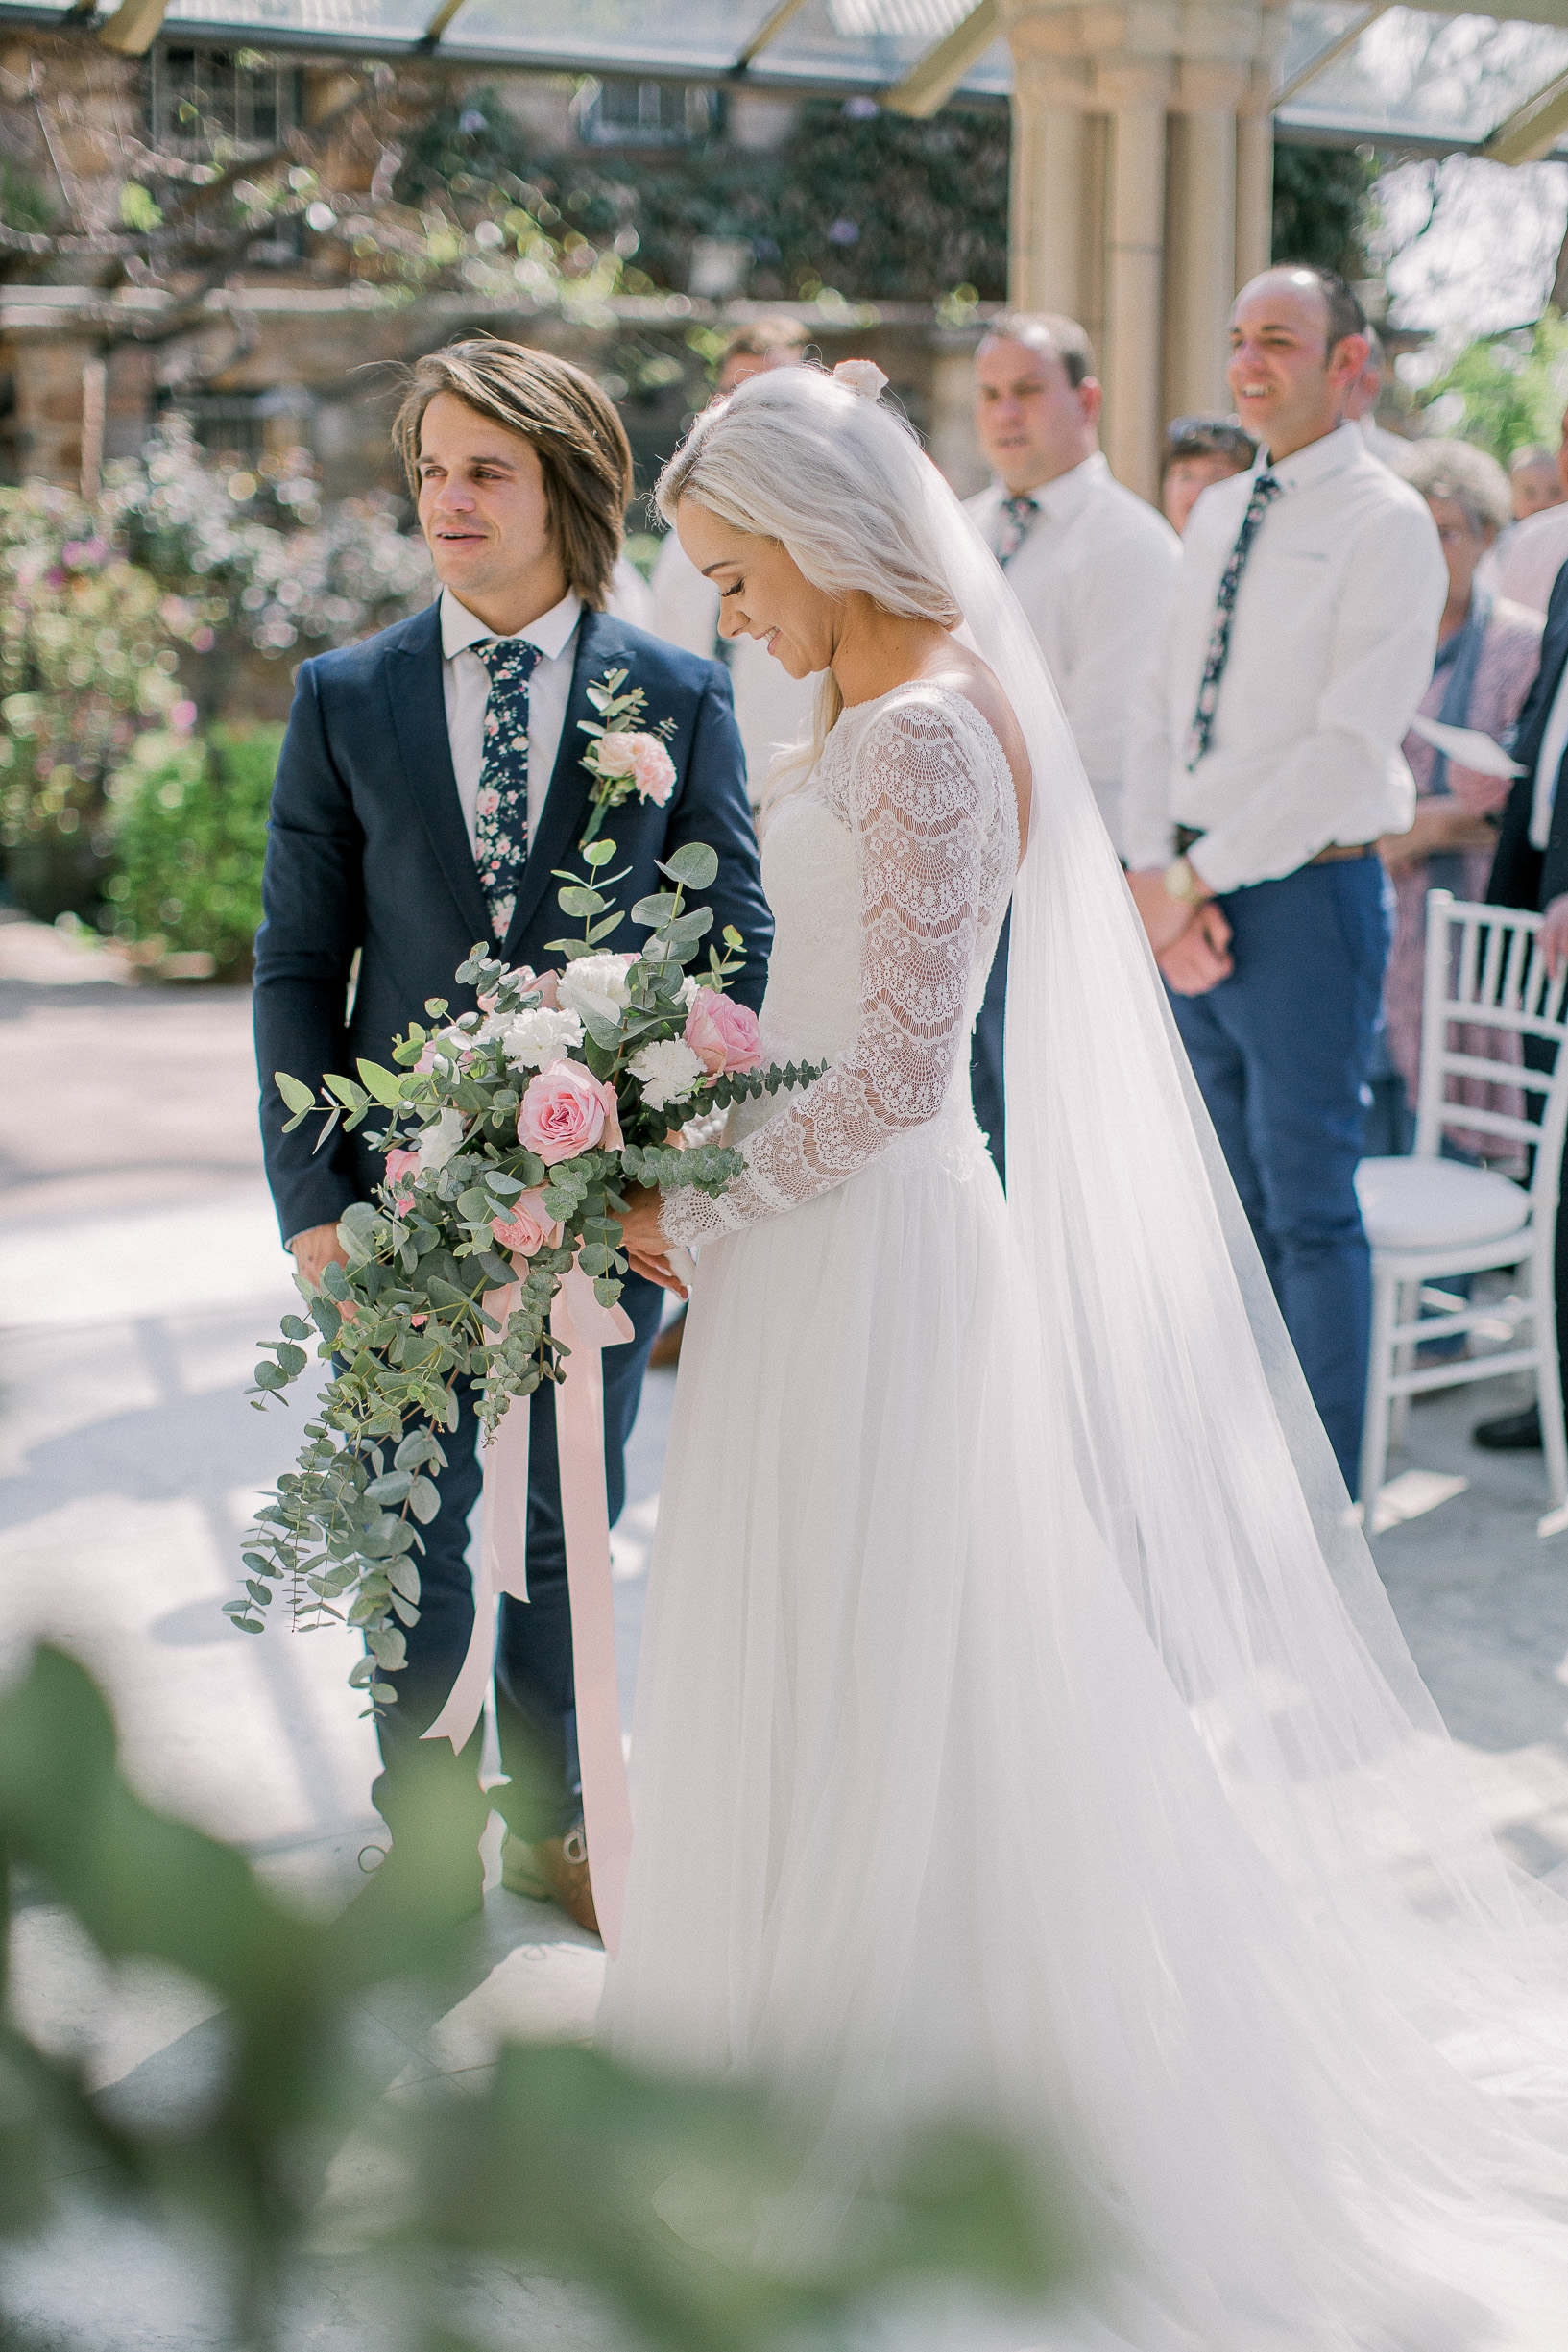 shepstone gardens wedding 2017019.jpg